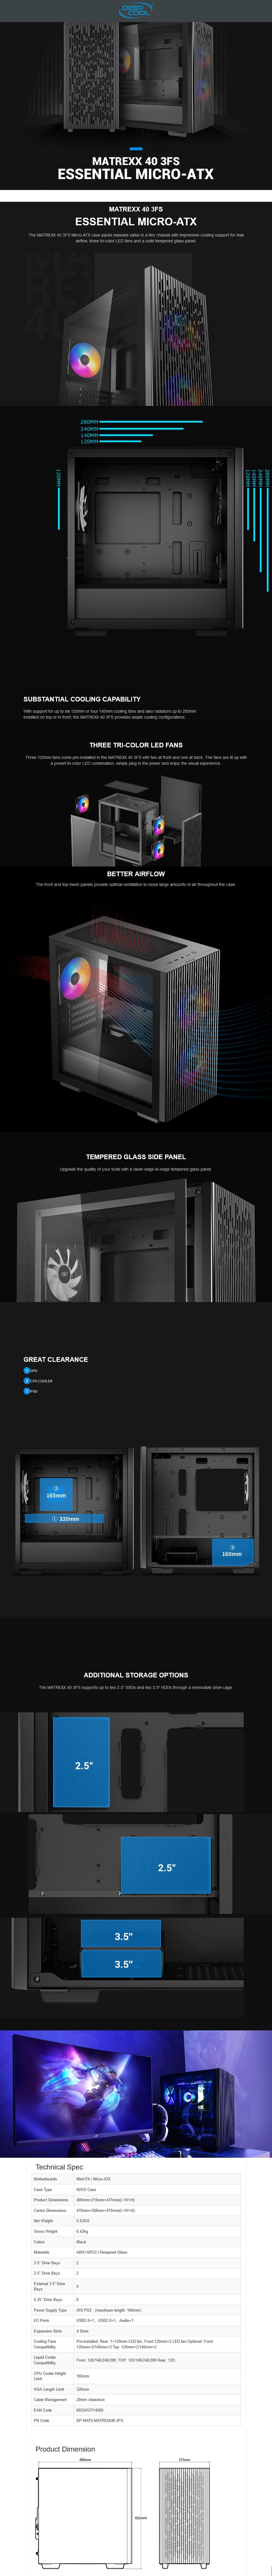 Deepcool Matrexx 40 3FS Tempered Glass Micro-ATX Case  - Overview 1